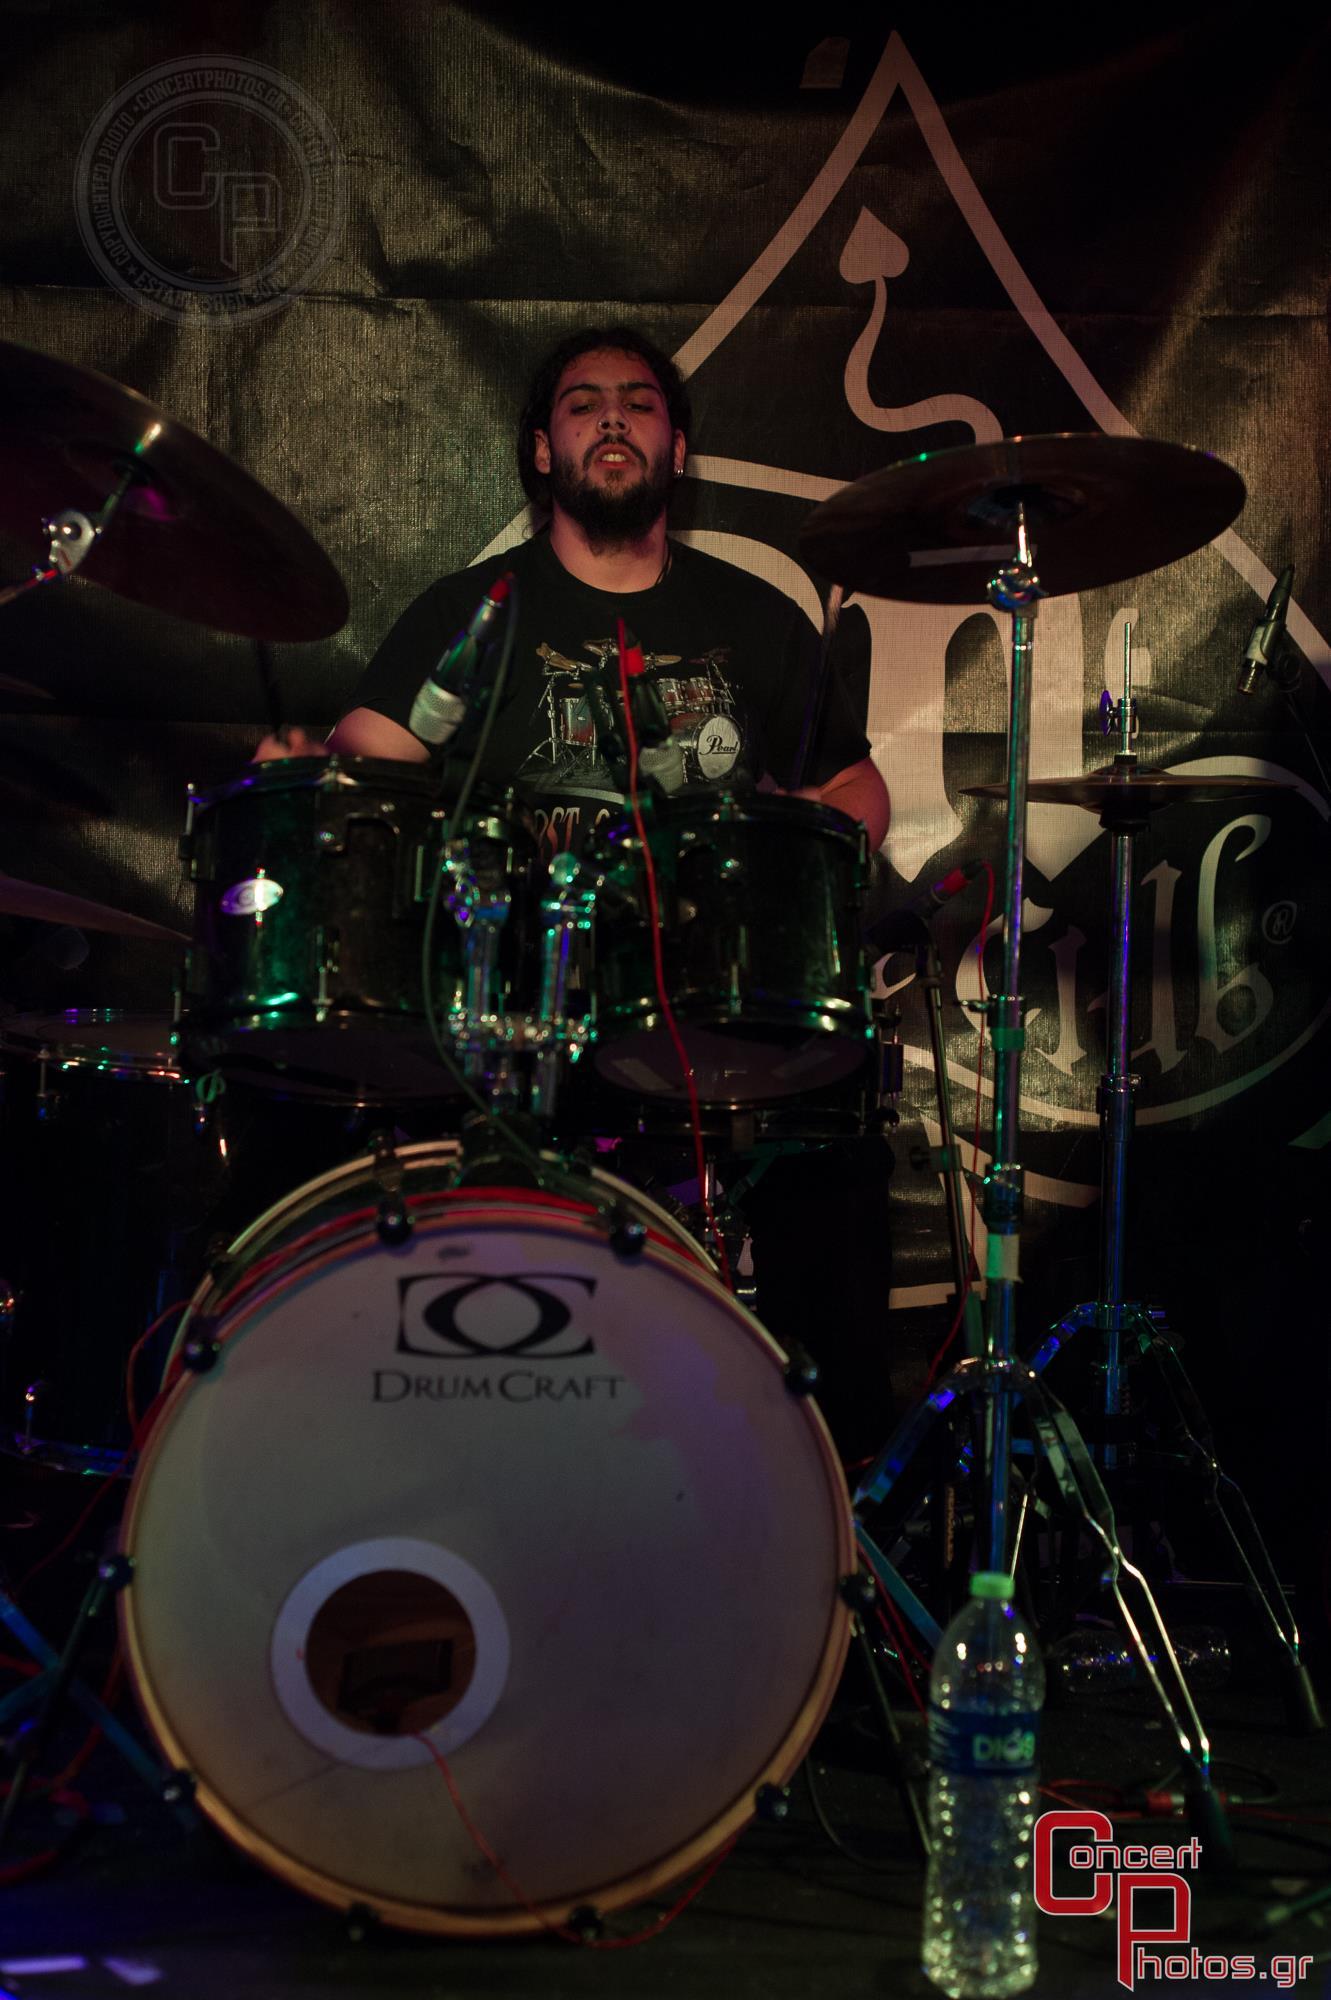 Battle Of The Bands Athens - Leg 3- photographer:  - ConcertPhotos - 20150105_0010_53